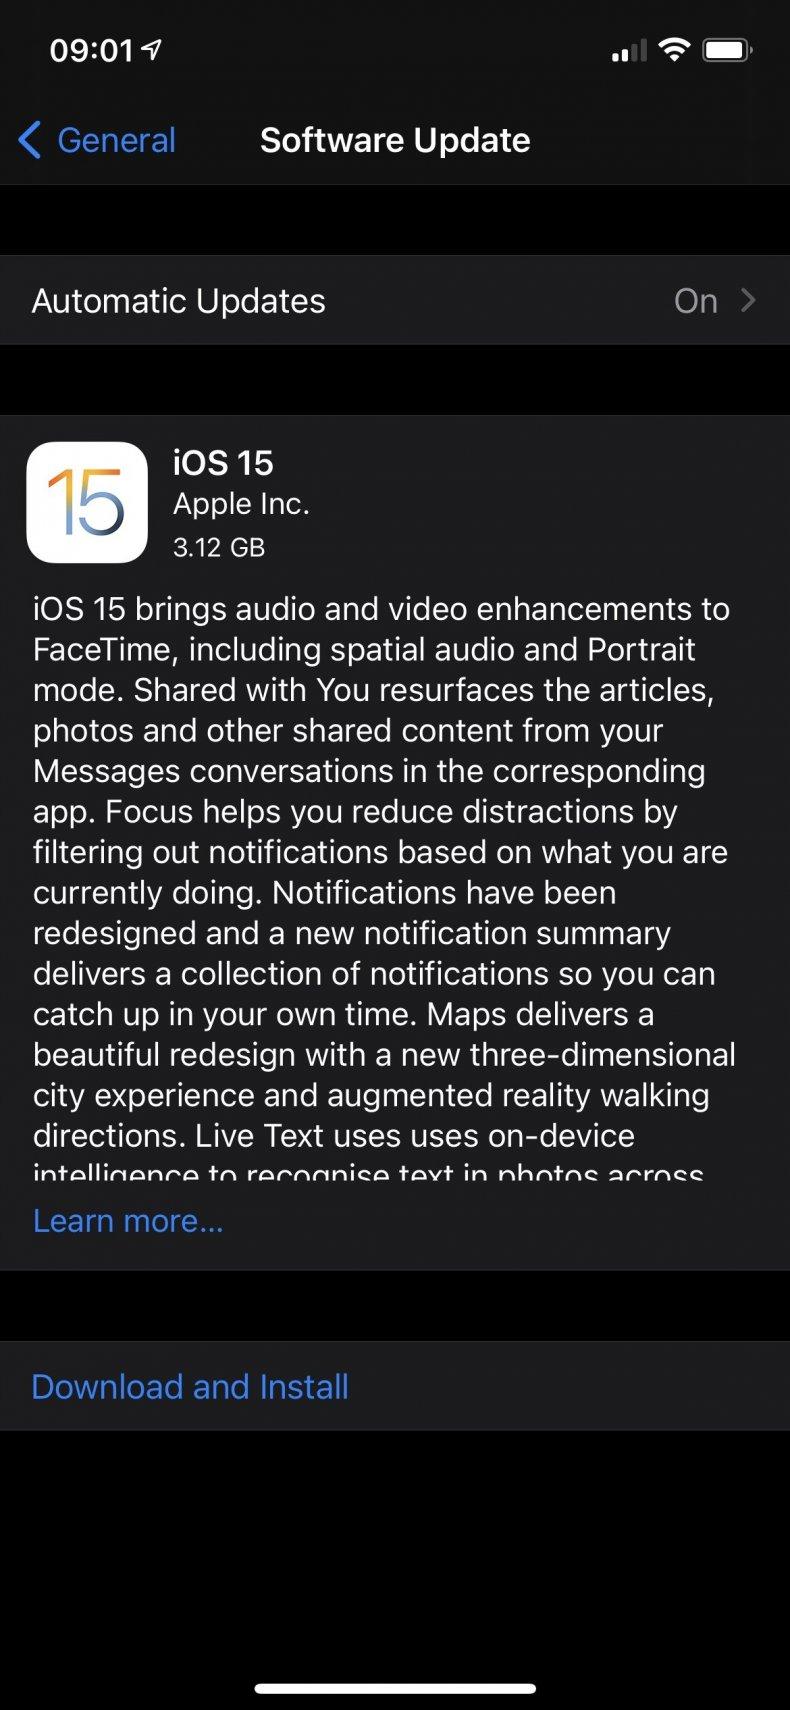 iOS 15 Software Update